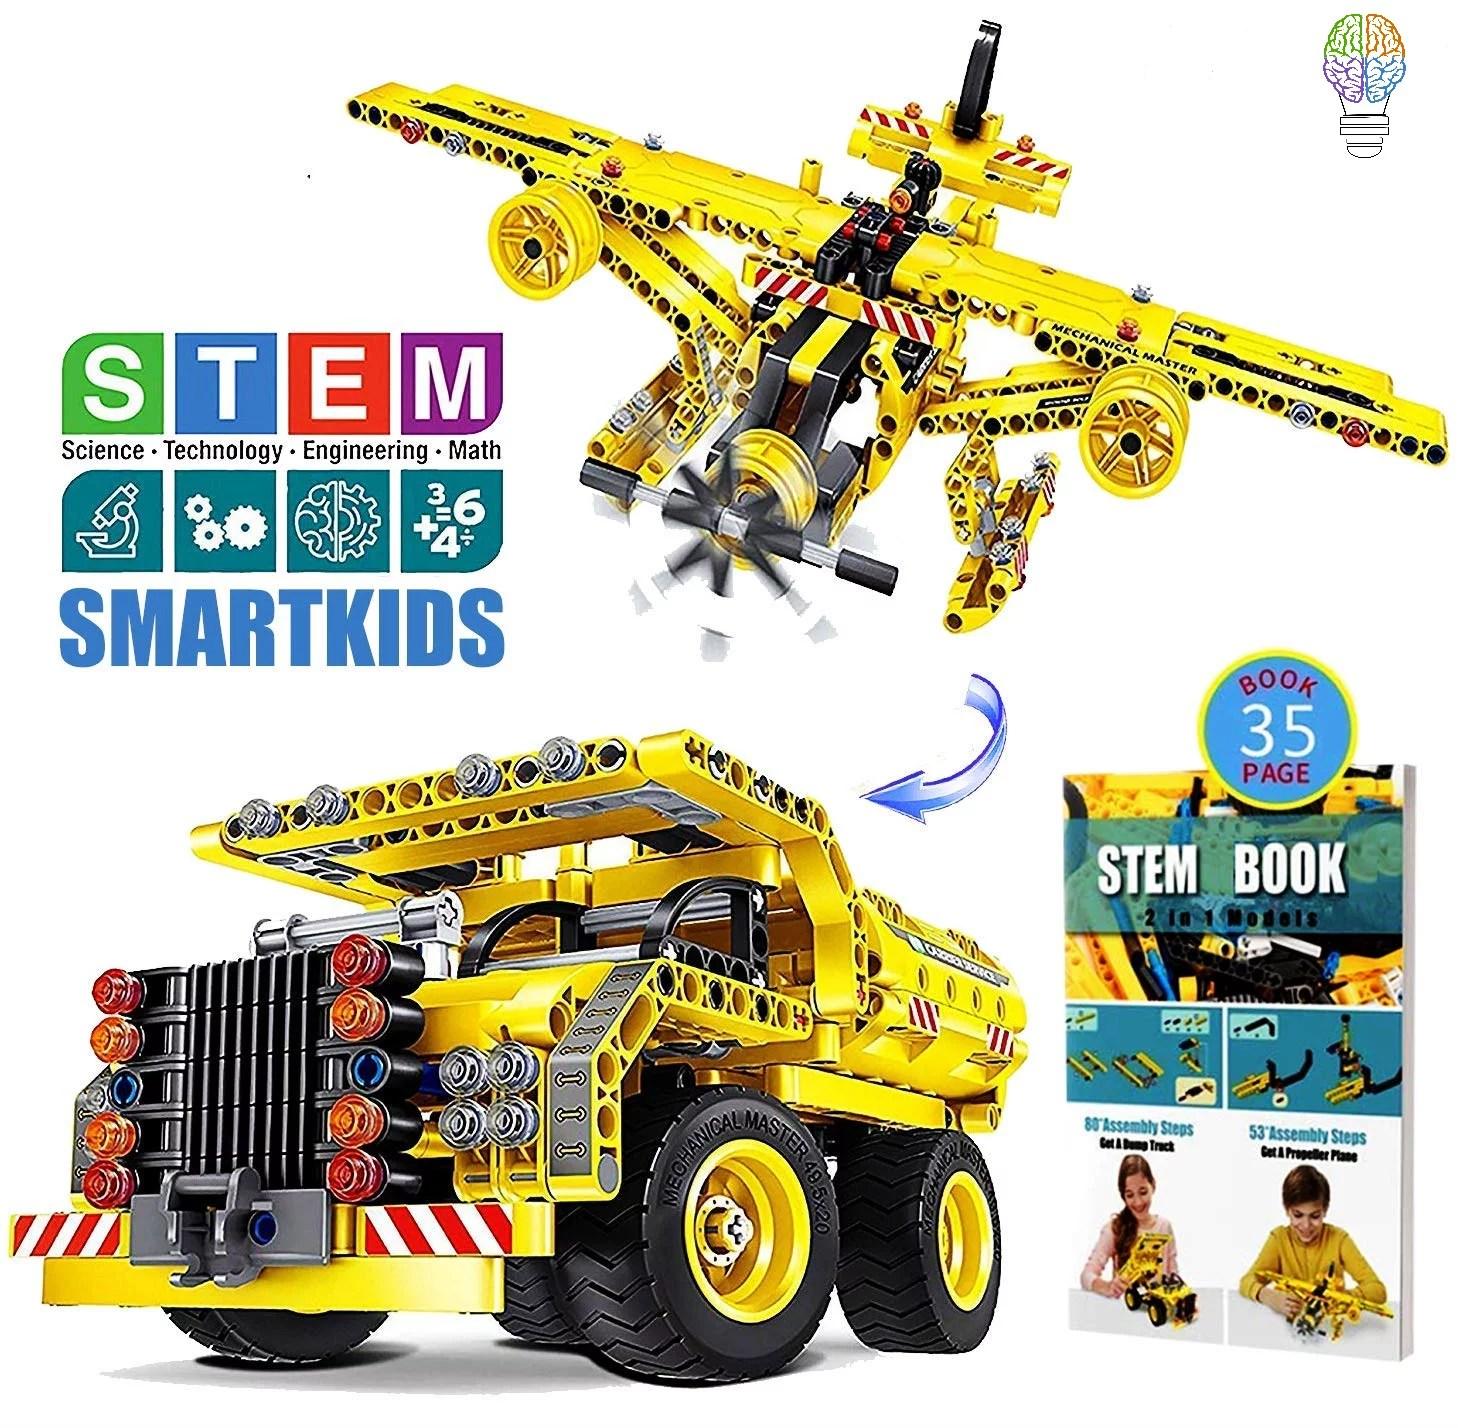 Building Toys Gifts For Boys Girls Age 6yr 12yr